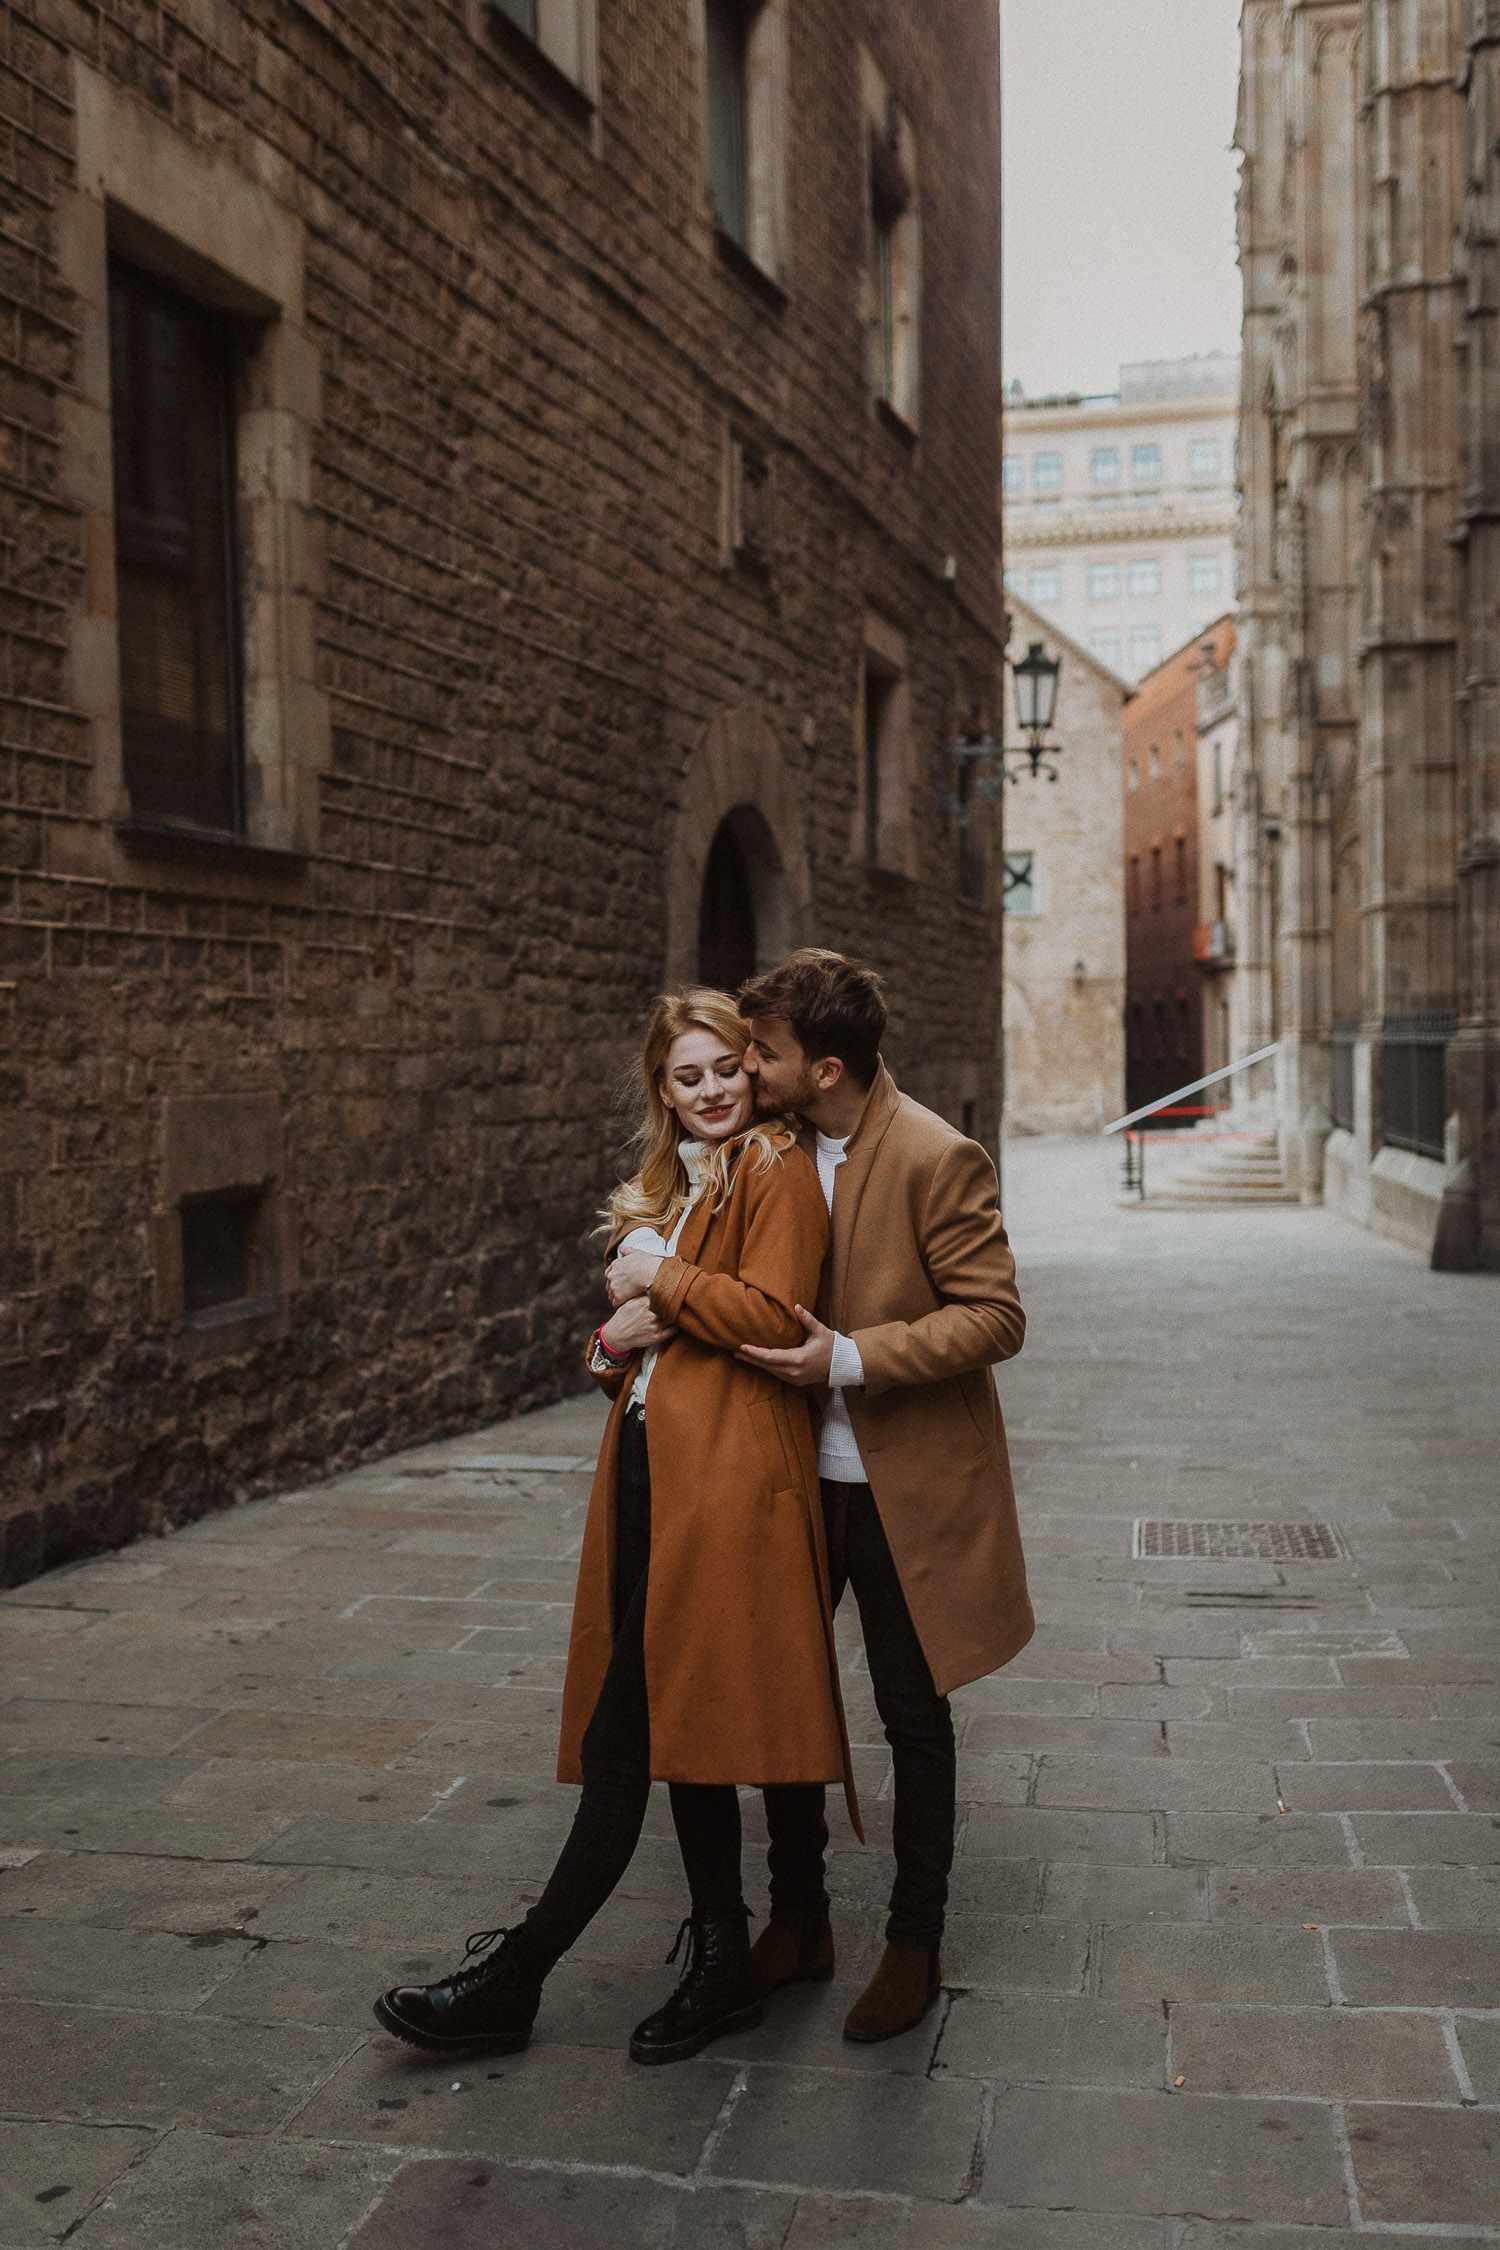 Travel photo shoot in Gothic, Barcelona